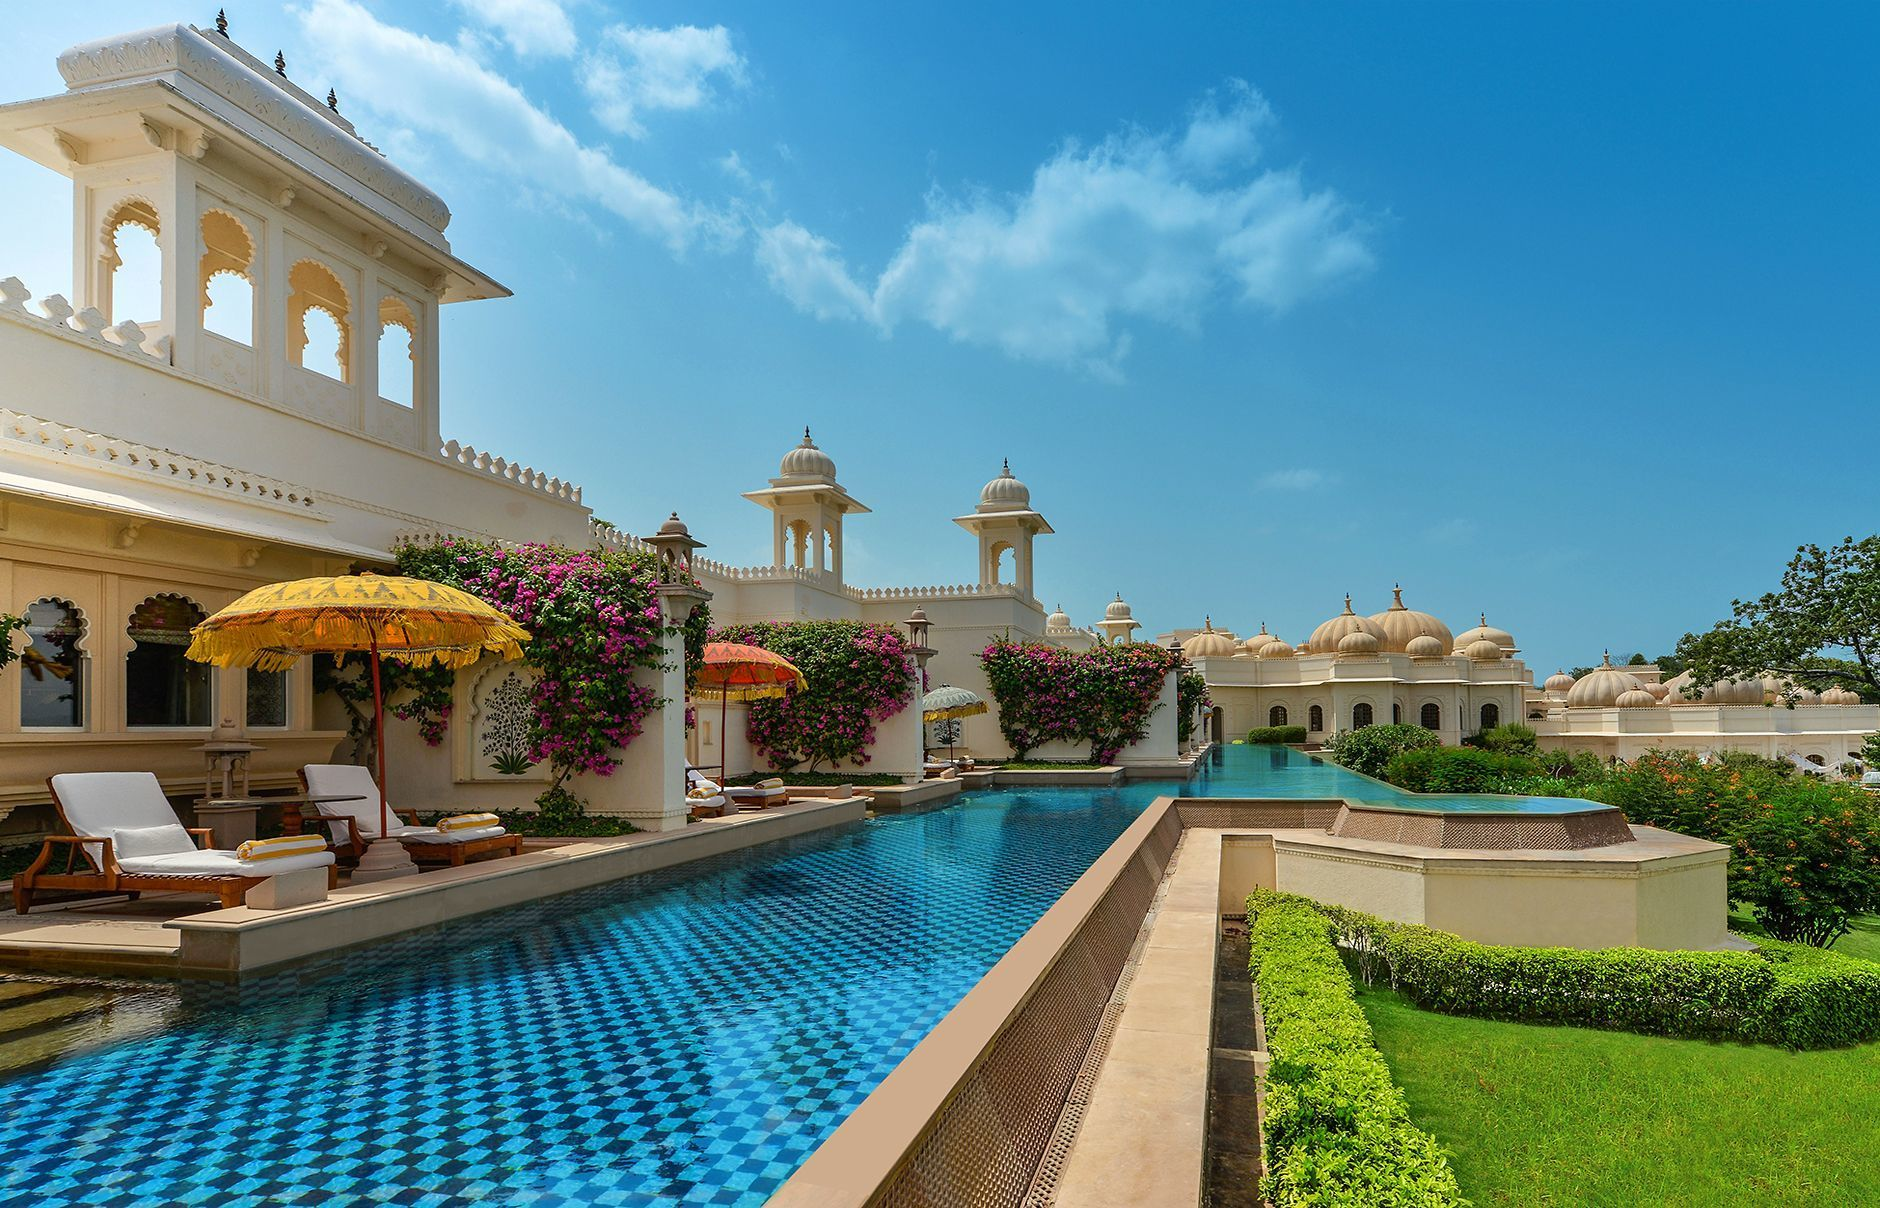 Oberoi Udaivilas – Udaipur, India